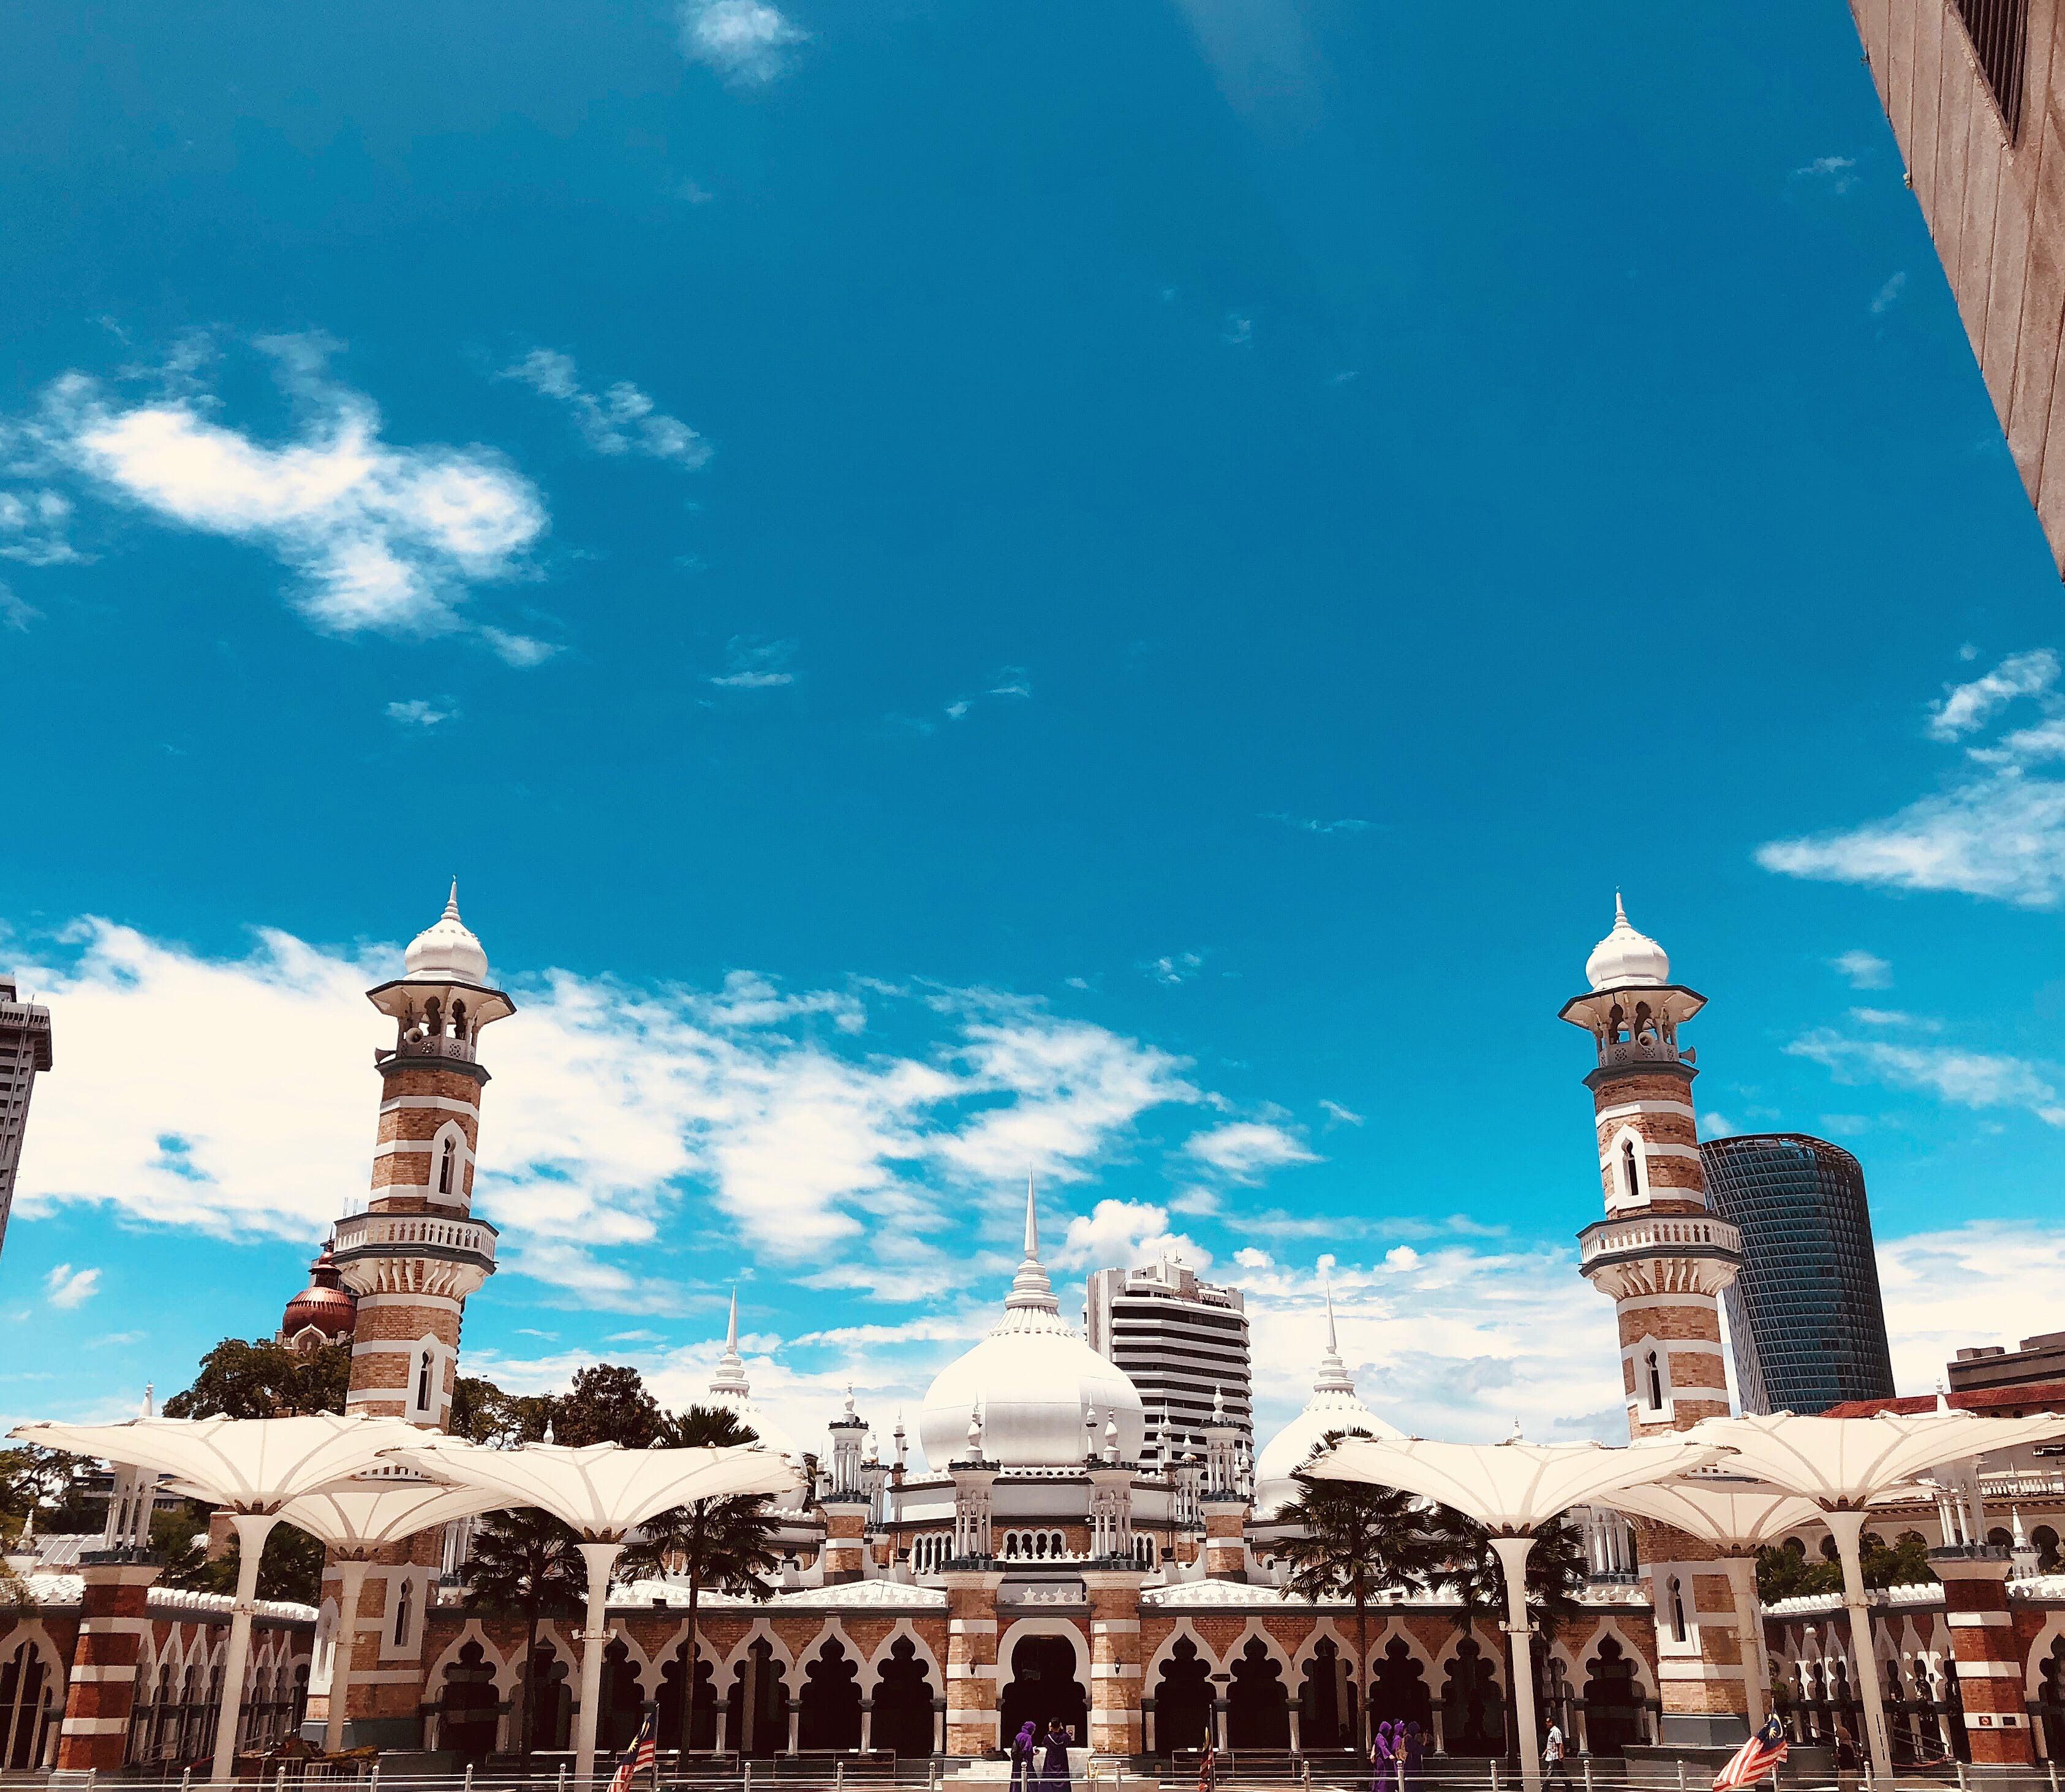 "Malaysia_RetreatTrip_MasjidJame_006"""""